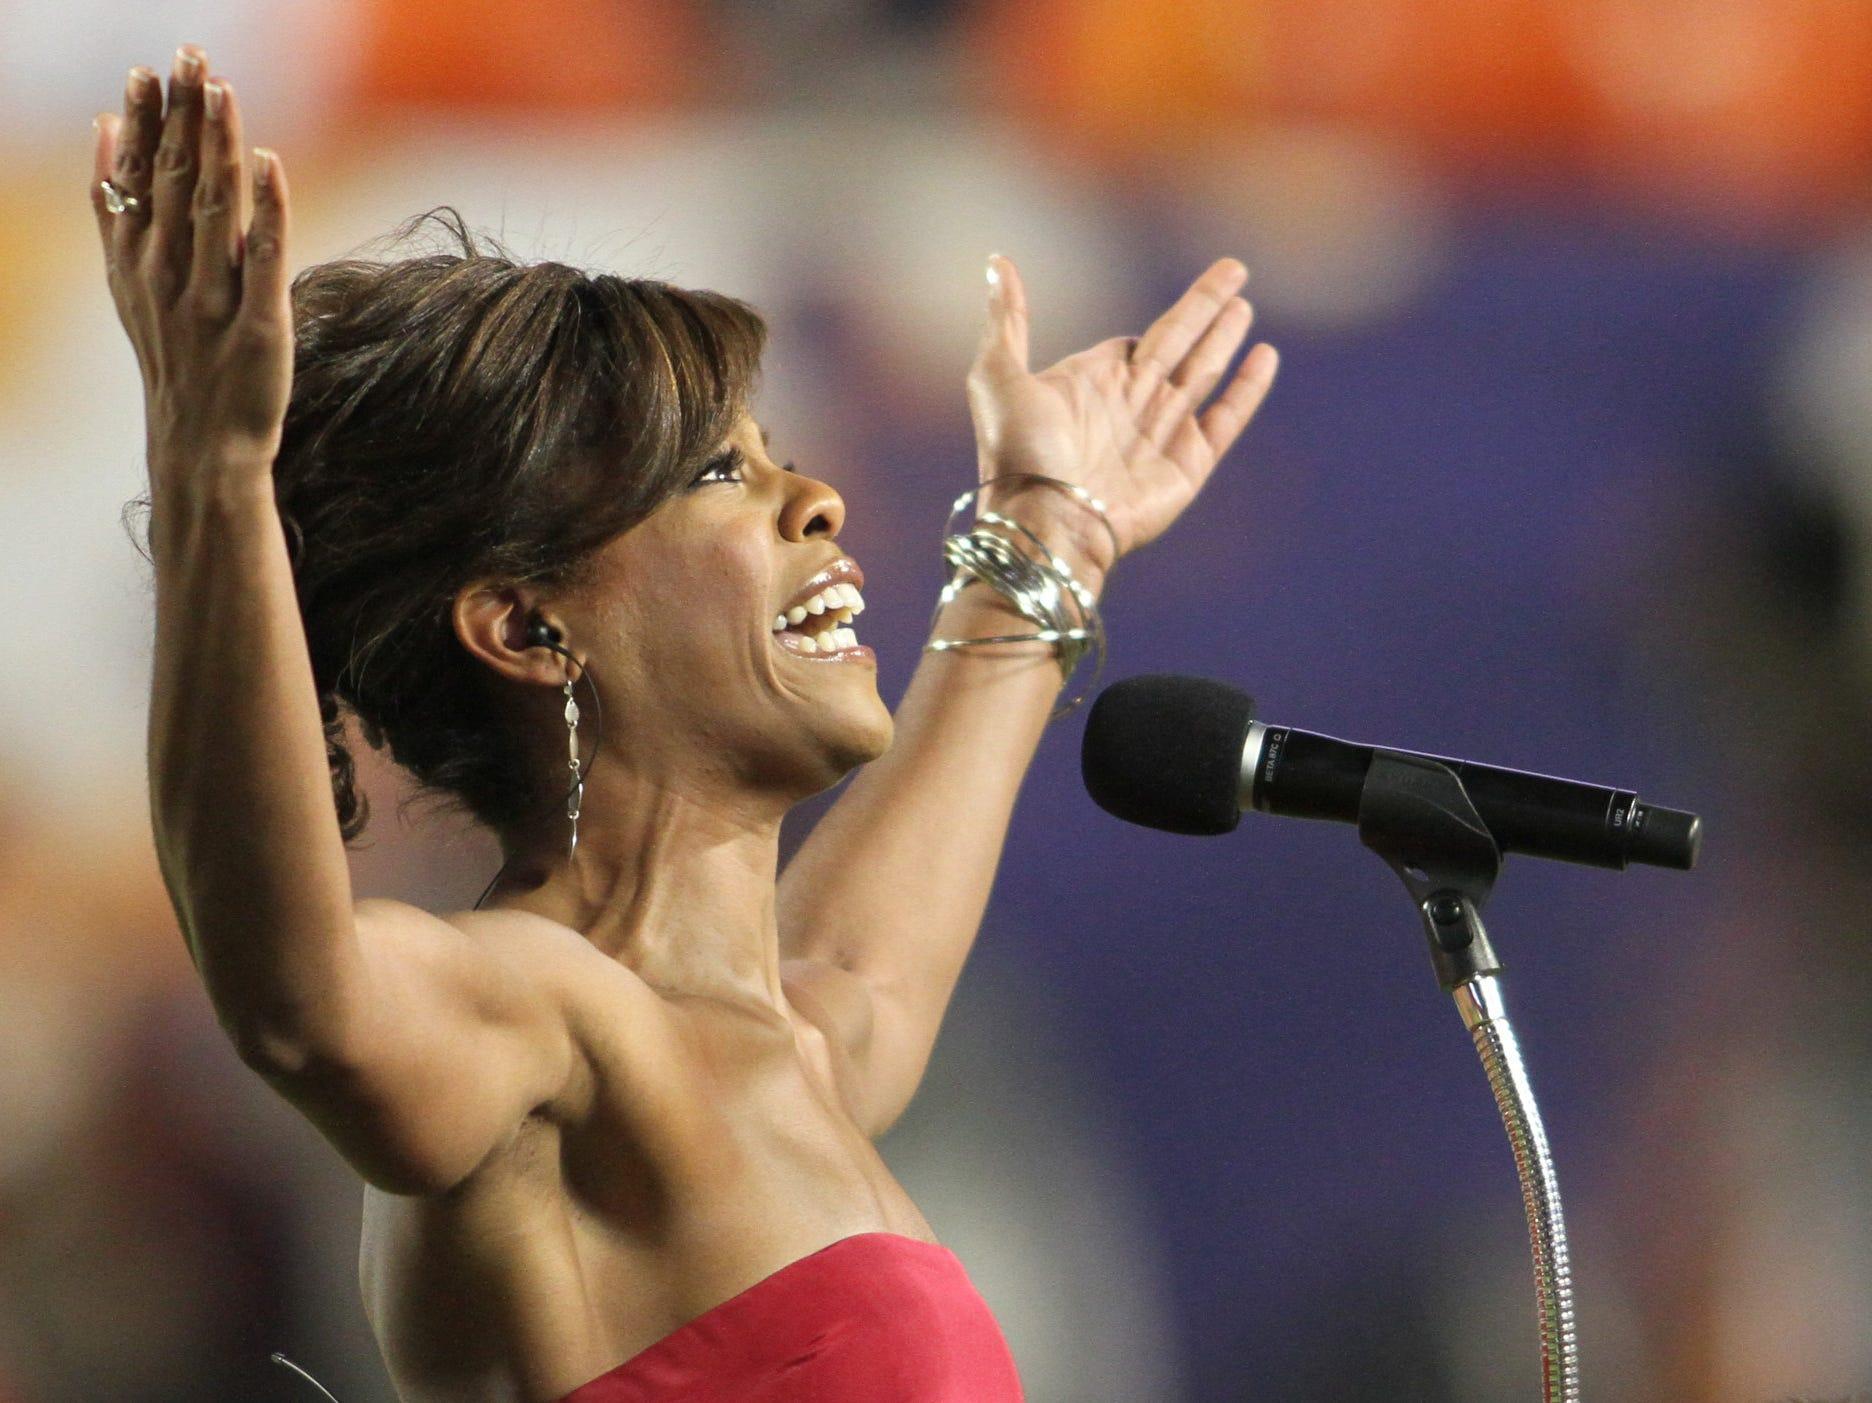 m010510orangefirsthalfRW - Orange Bowl -  -  Big Ten's Iowa vs. ACC's Georgia Tech Jan. 5, 2010.  Noted Jazz Singer Nicole Henry sings the National Anthem Tuesday at the 2010 Orange Bowl at Land Shark  Stadium in Miami Gardens.